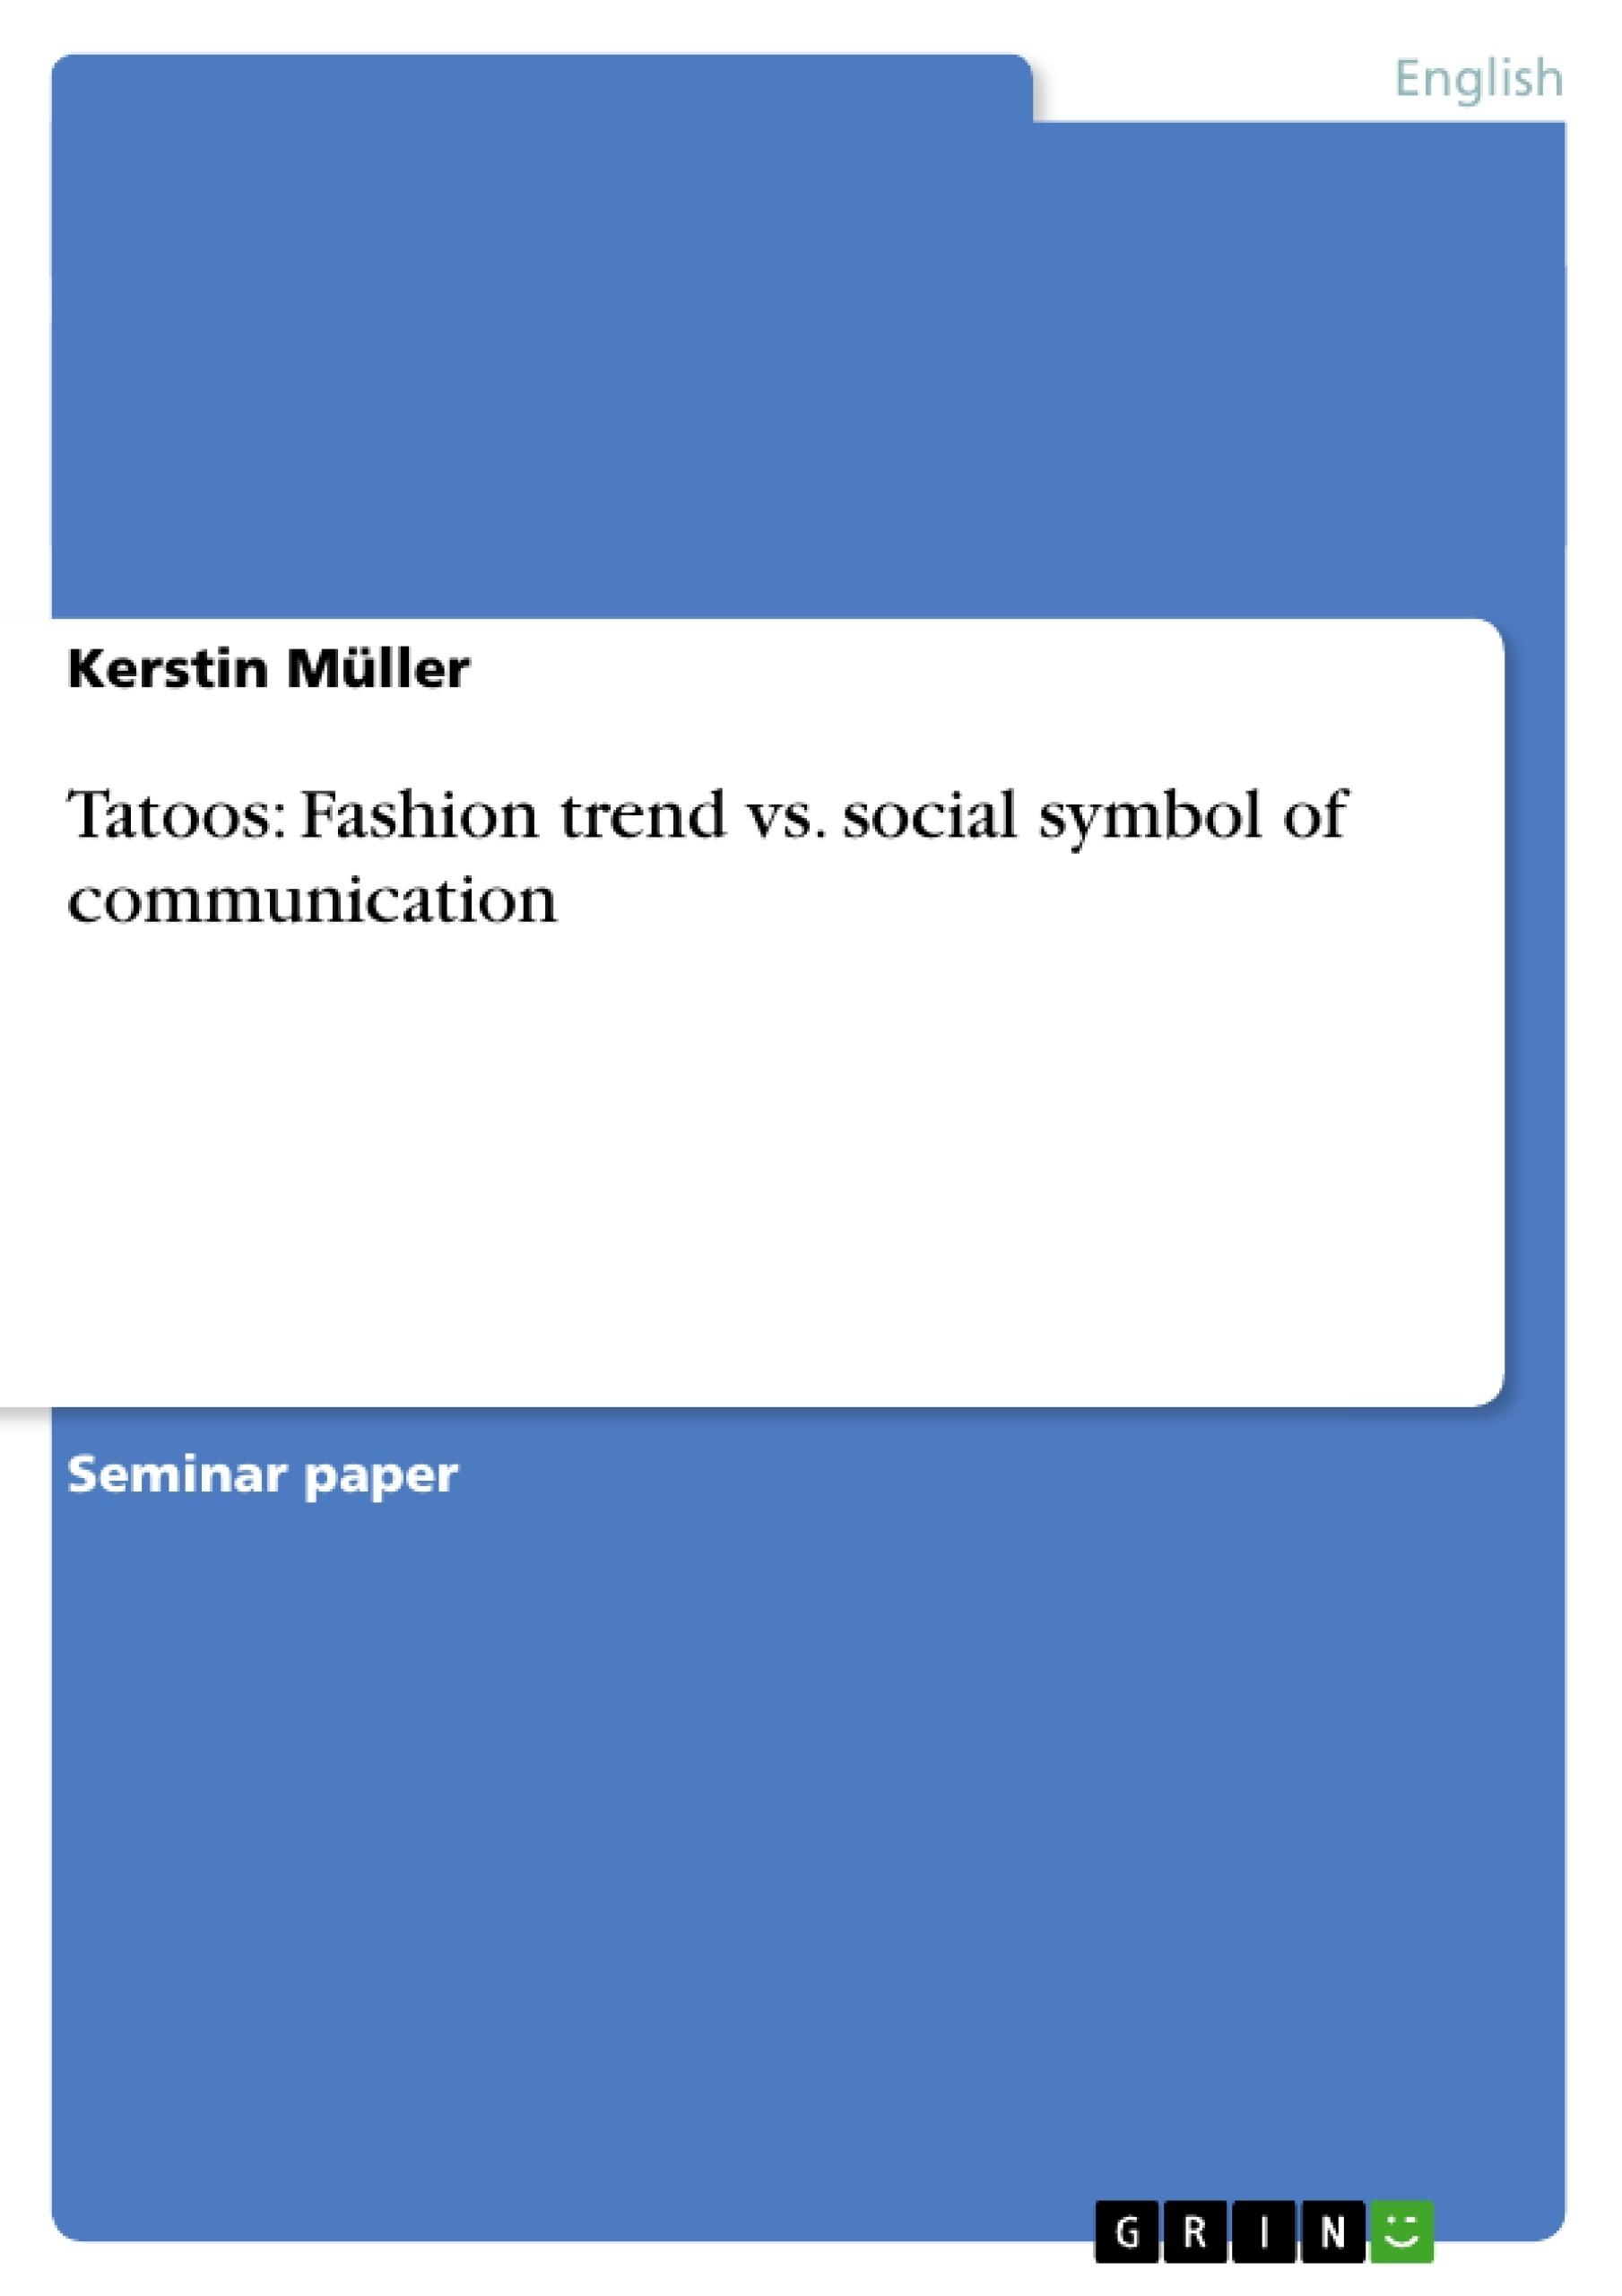 Title: Tatoos: Fashion trend vs. social symbol of communication